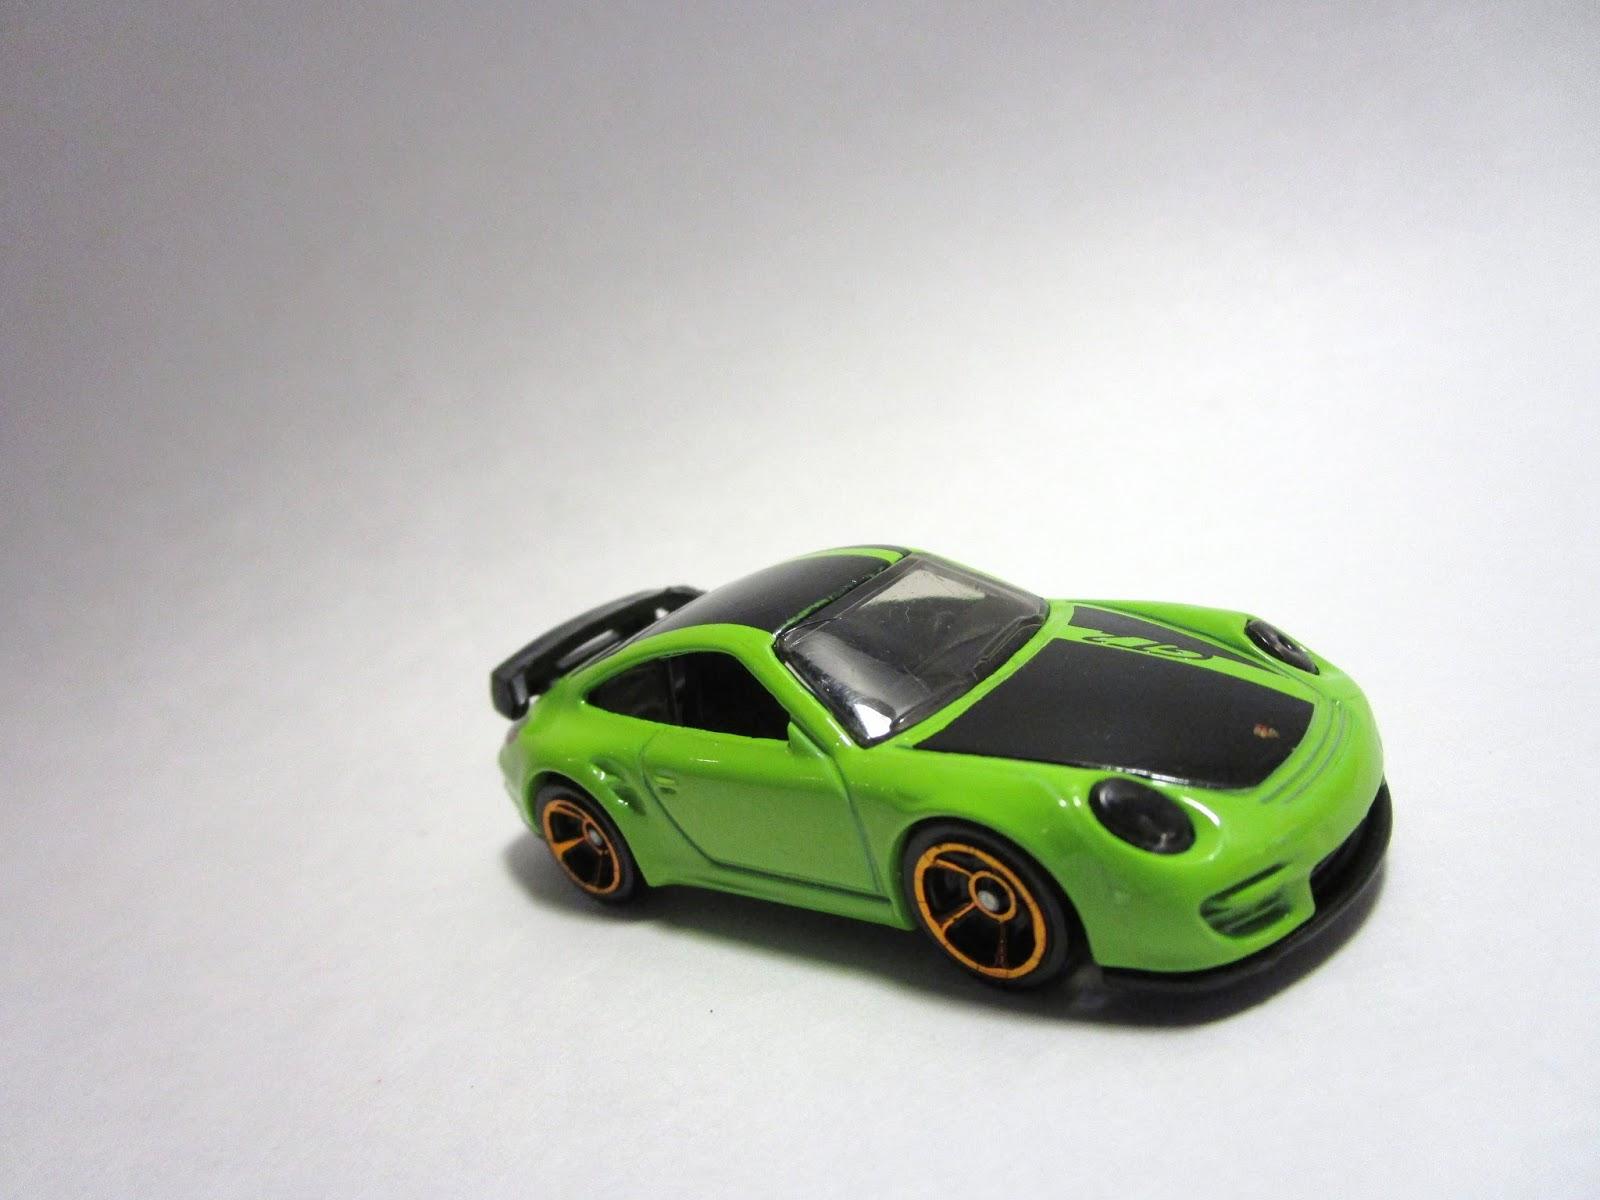 IMG_4533 Outstanding Porsche 911 Gt2 Hot Wheels Cars Trend